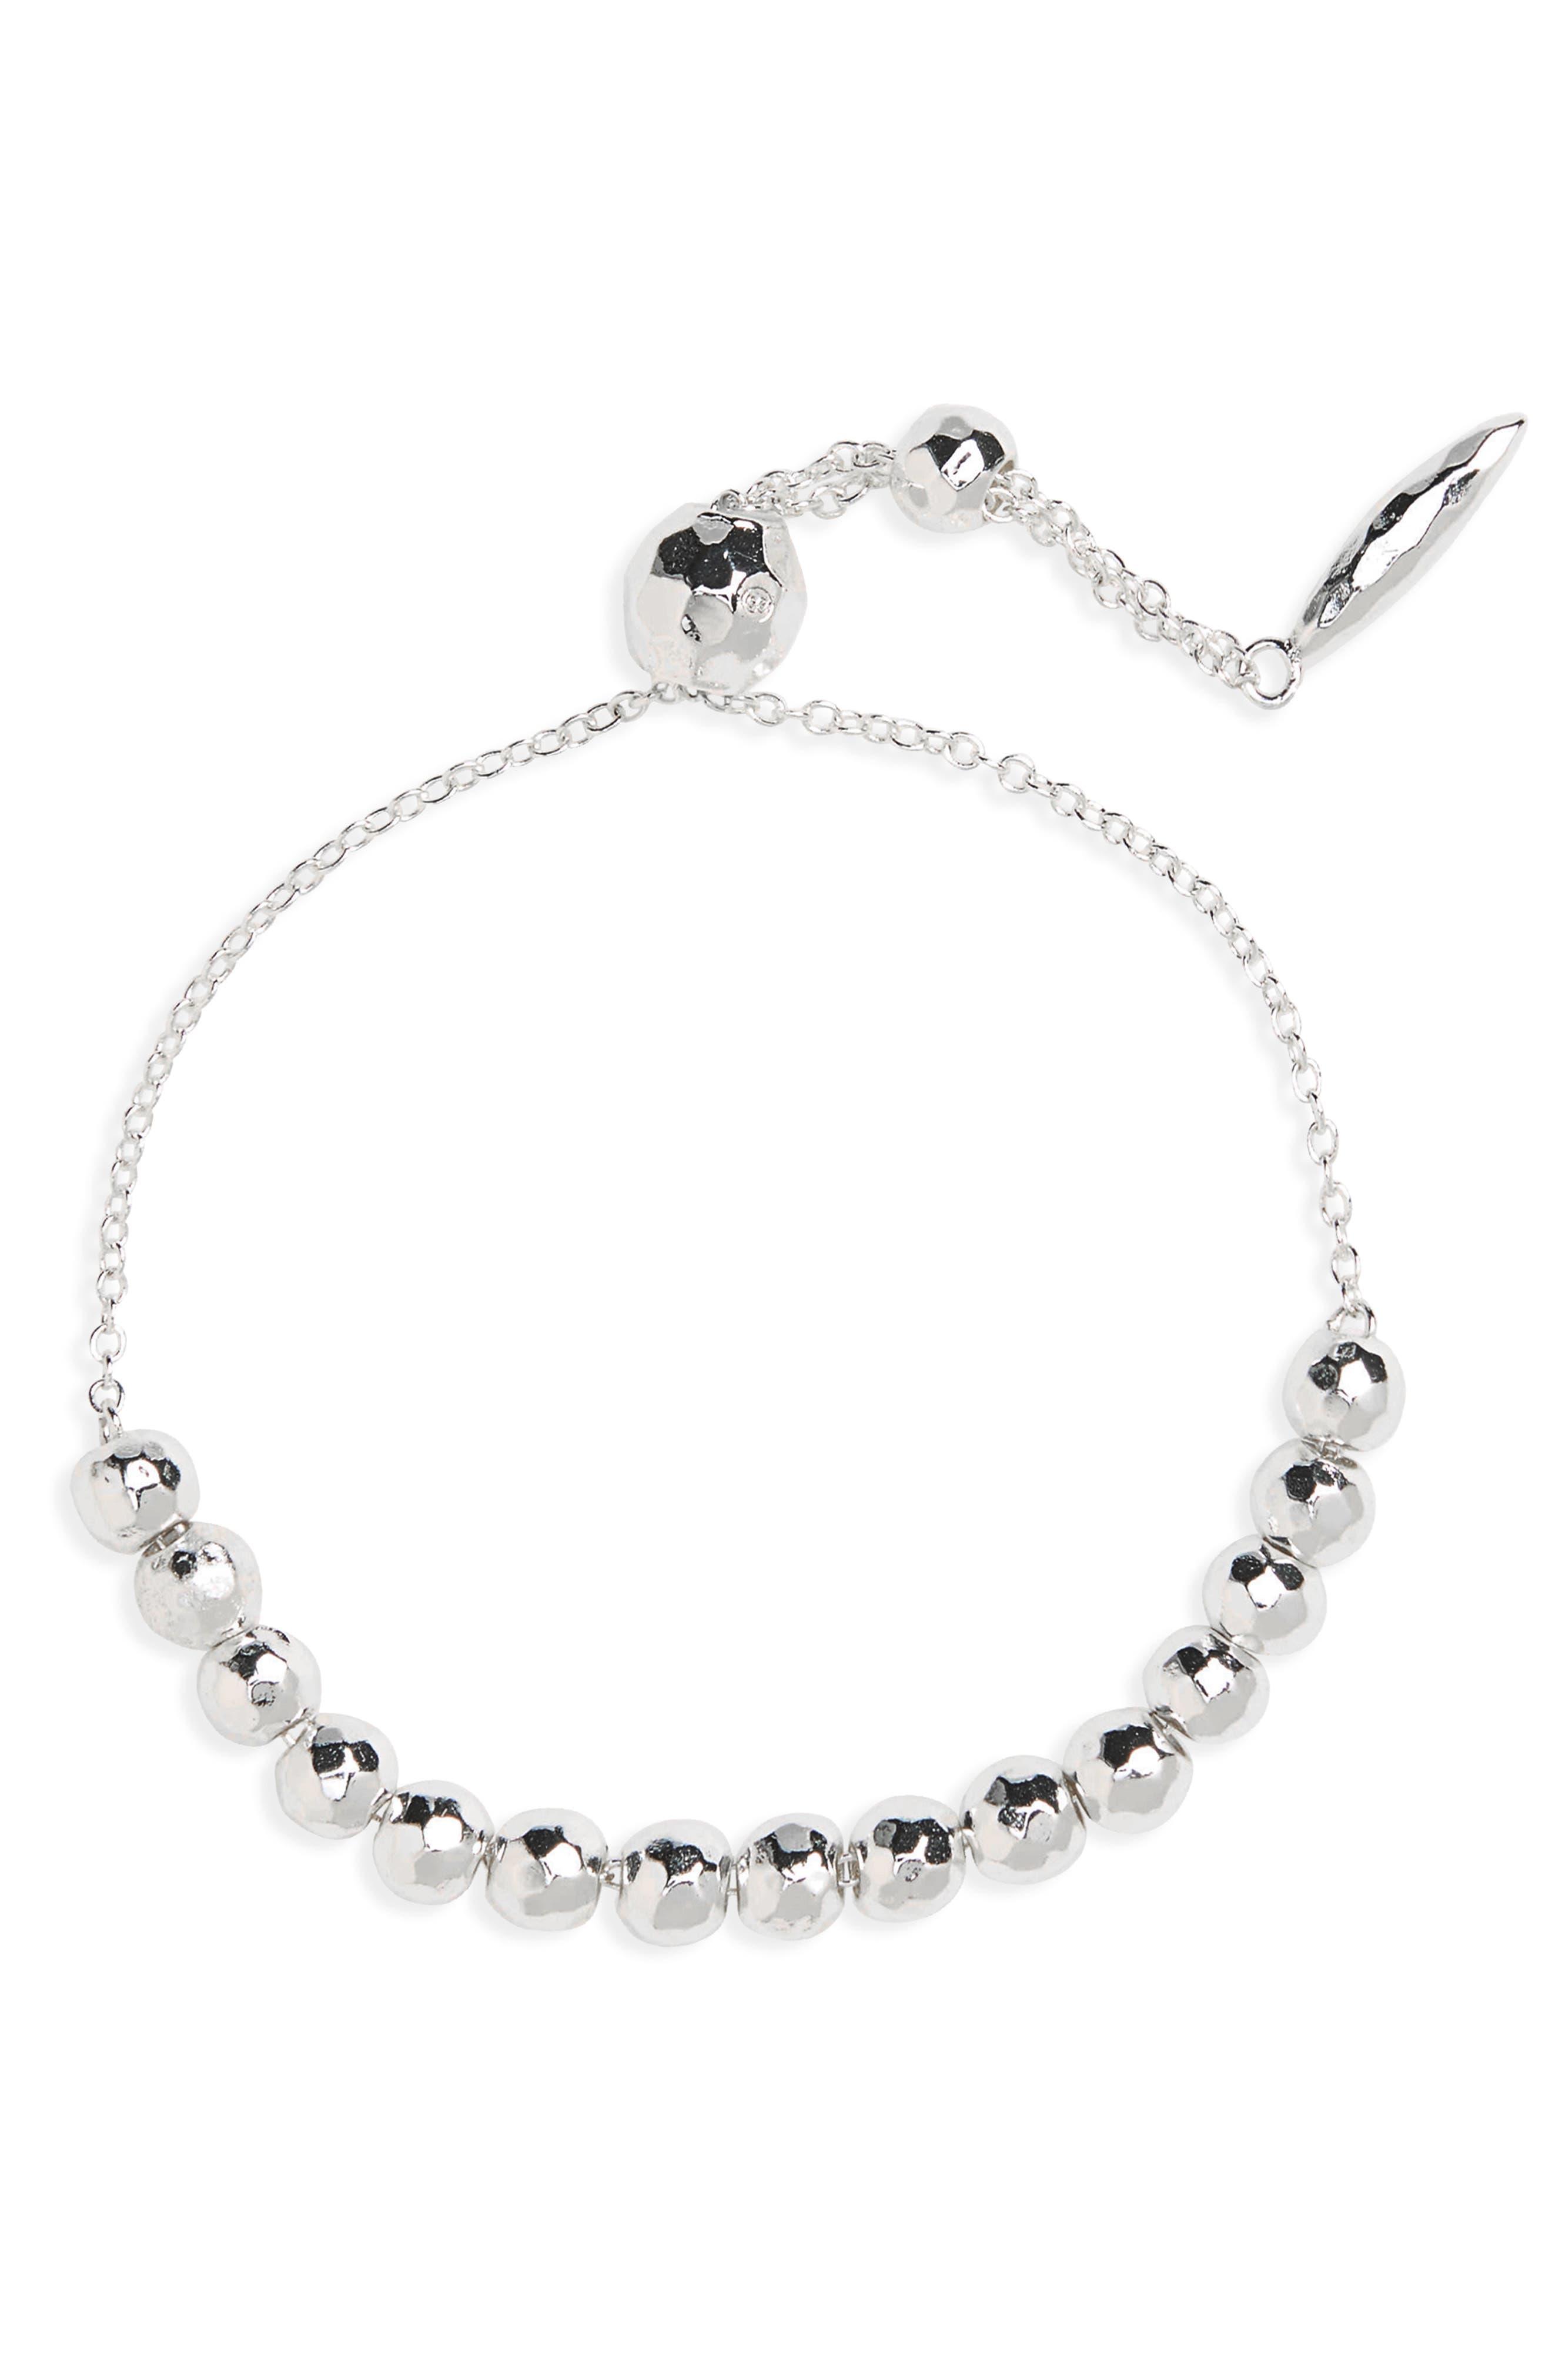 GORJANA Laguna Adjustable Bracelet, Main, color, SILVER